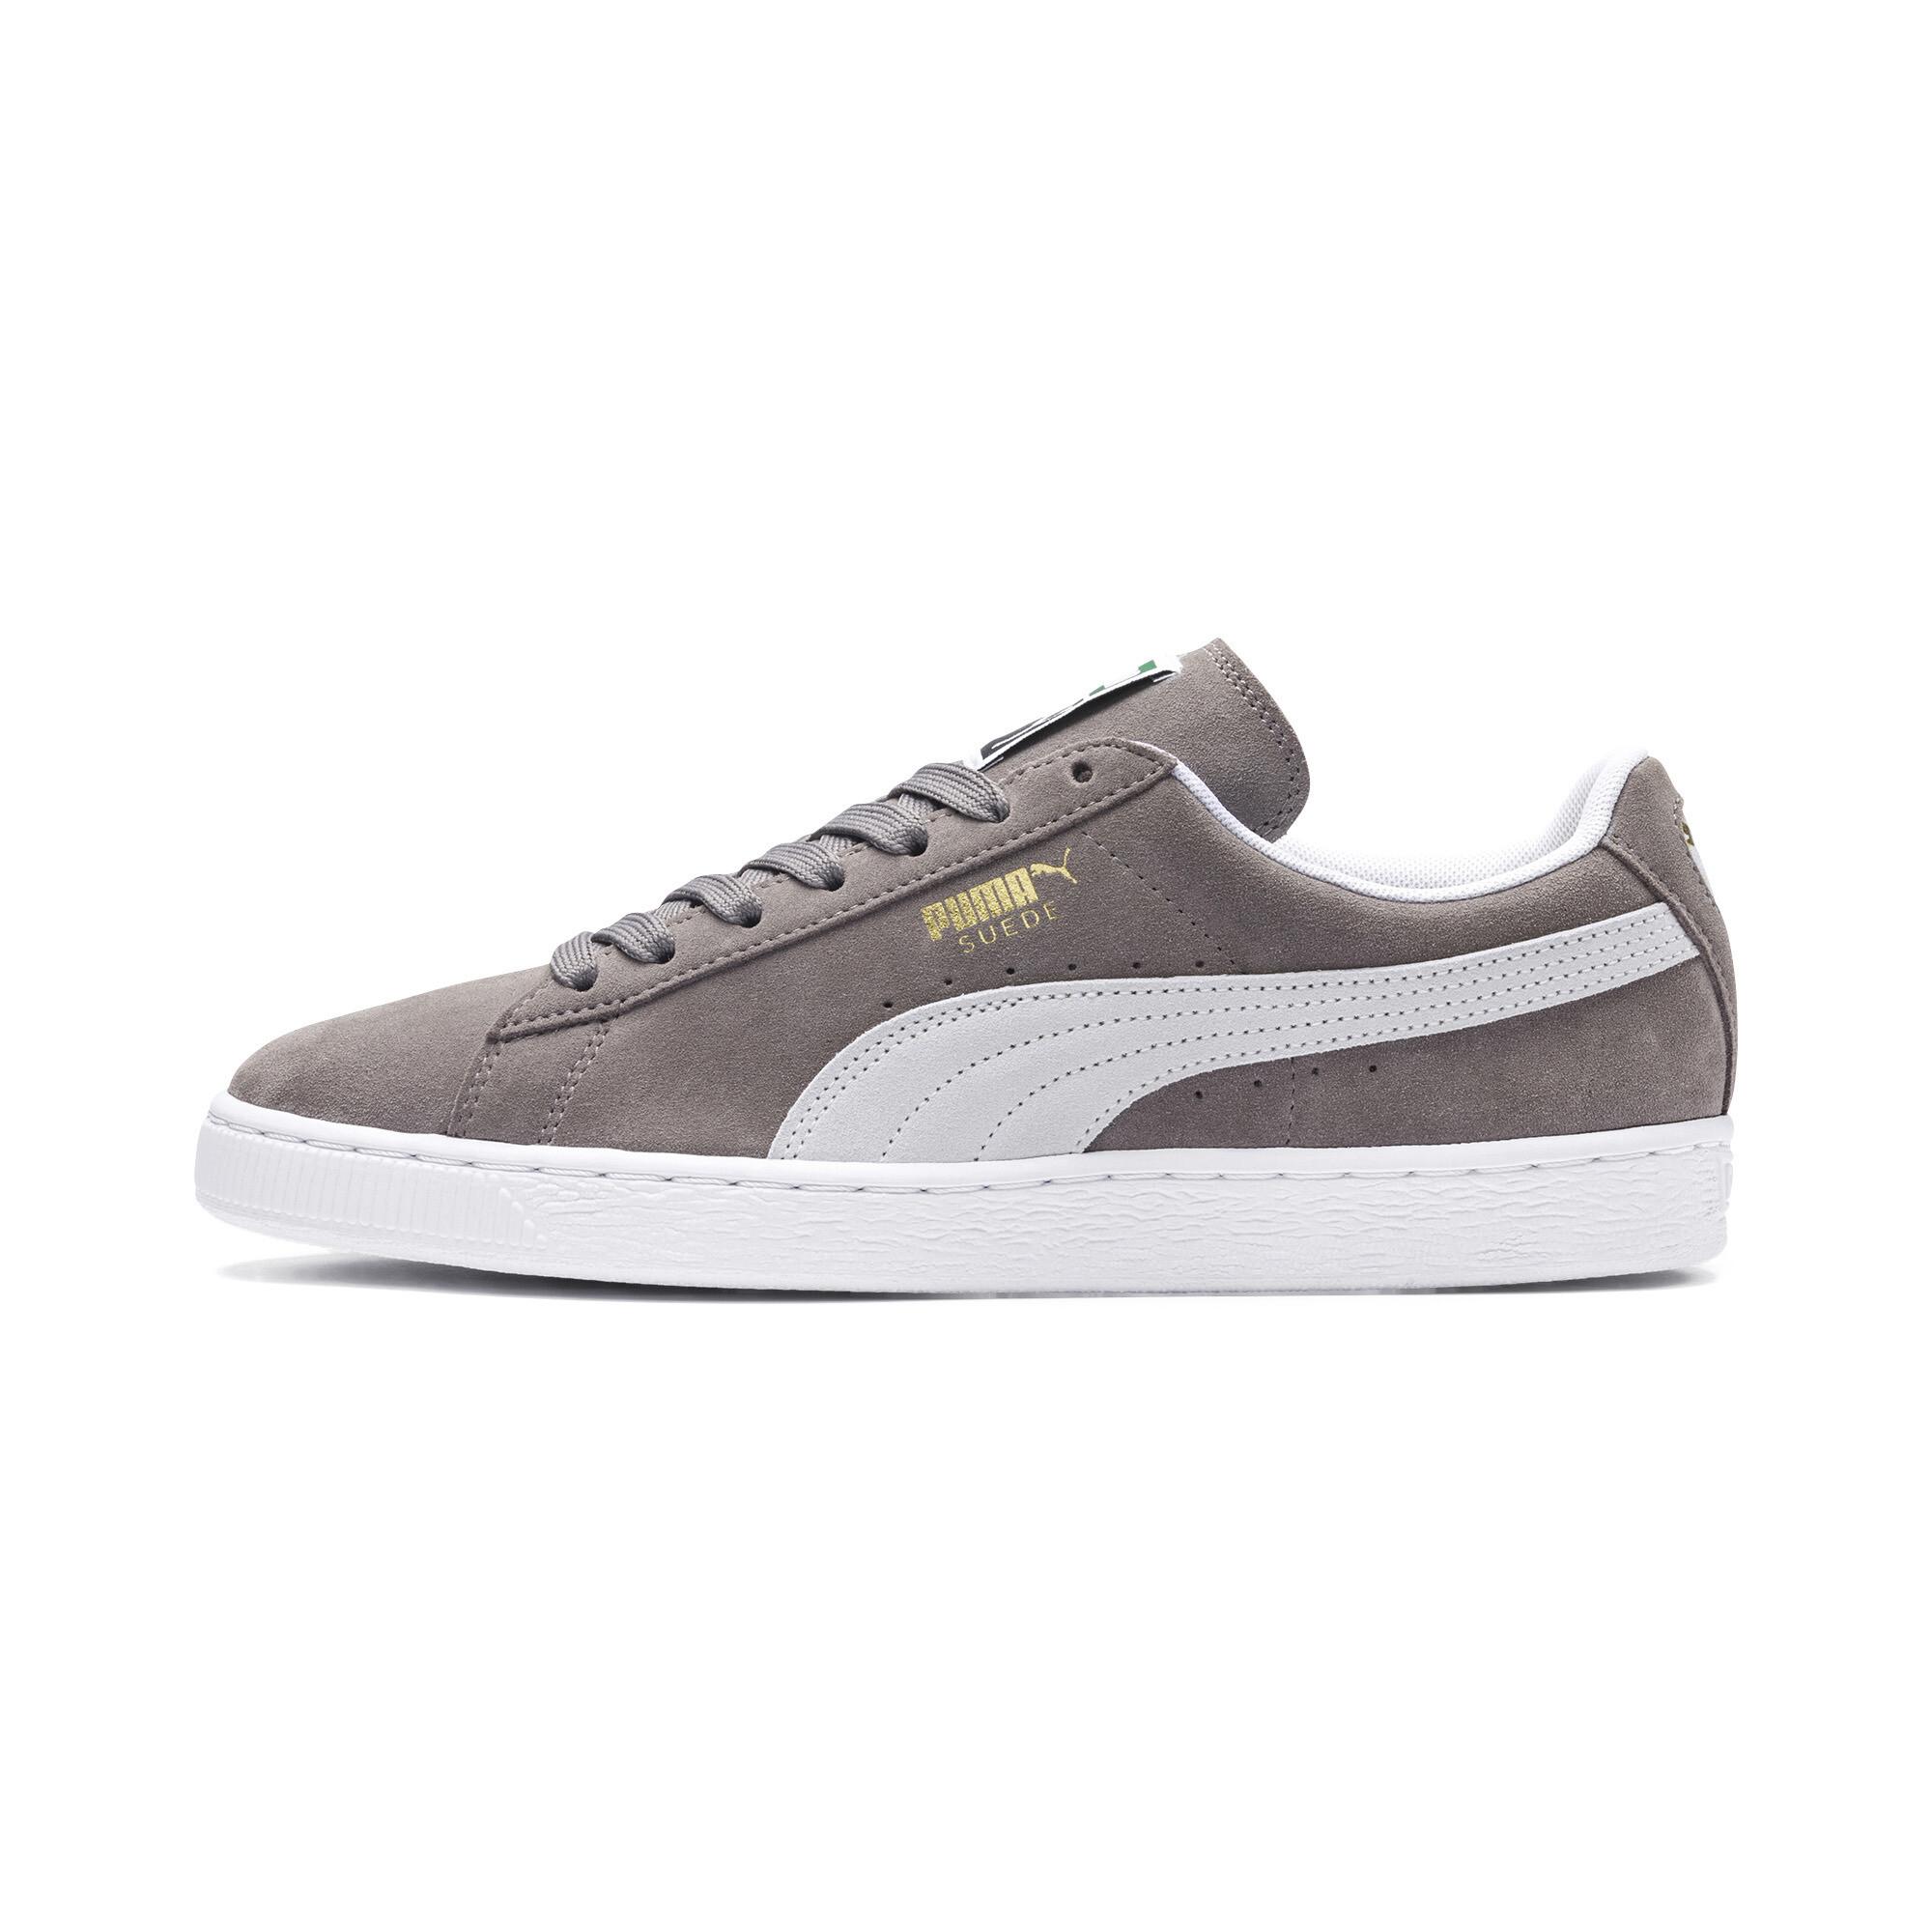 PUMA-Suede-Classic-Sneakers-Men-Shoe-Sport-Shoe thumbnail 13